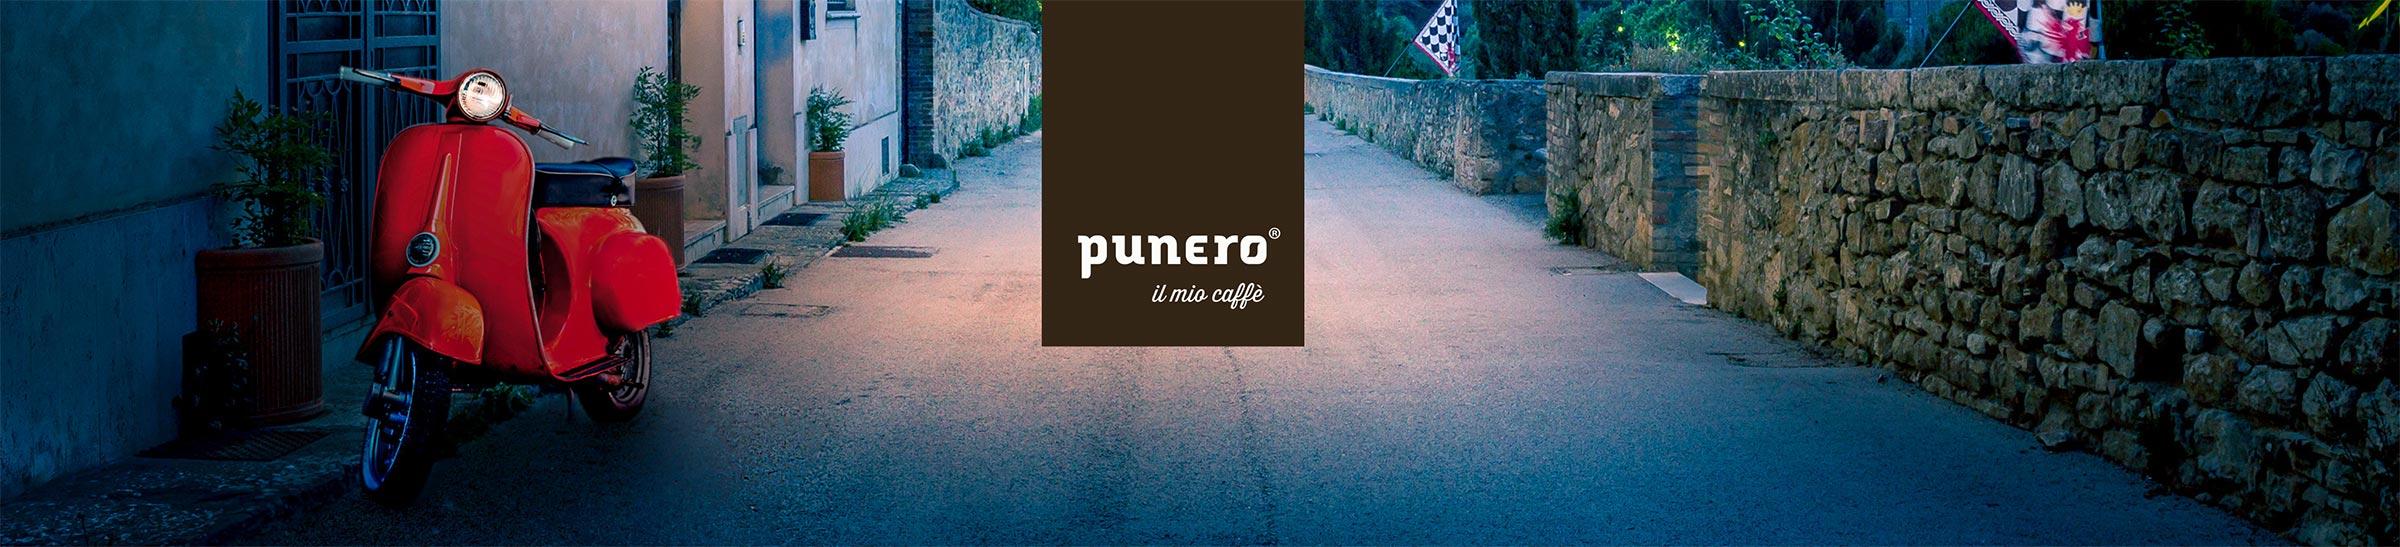 01_Banner_Head_punero_144